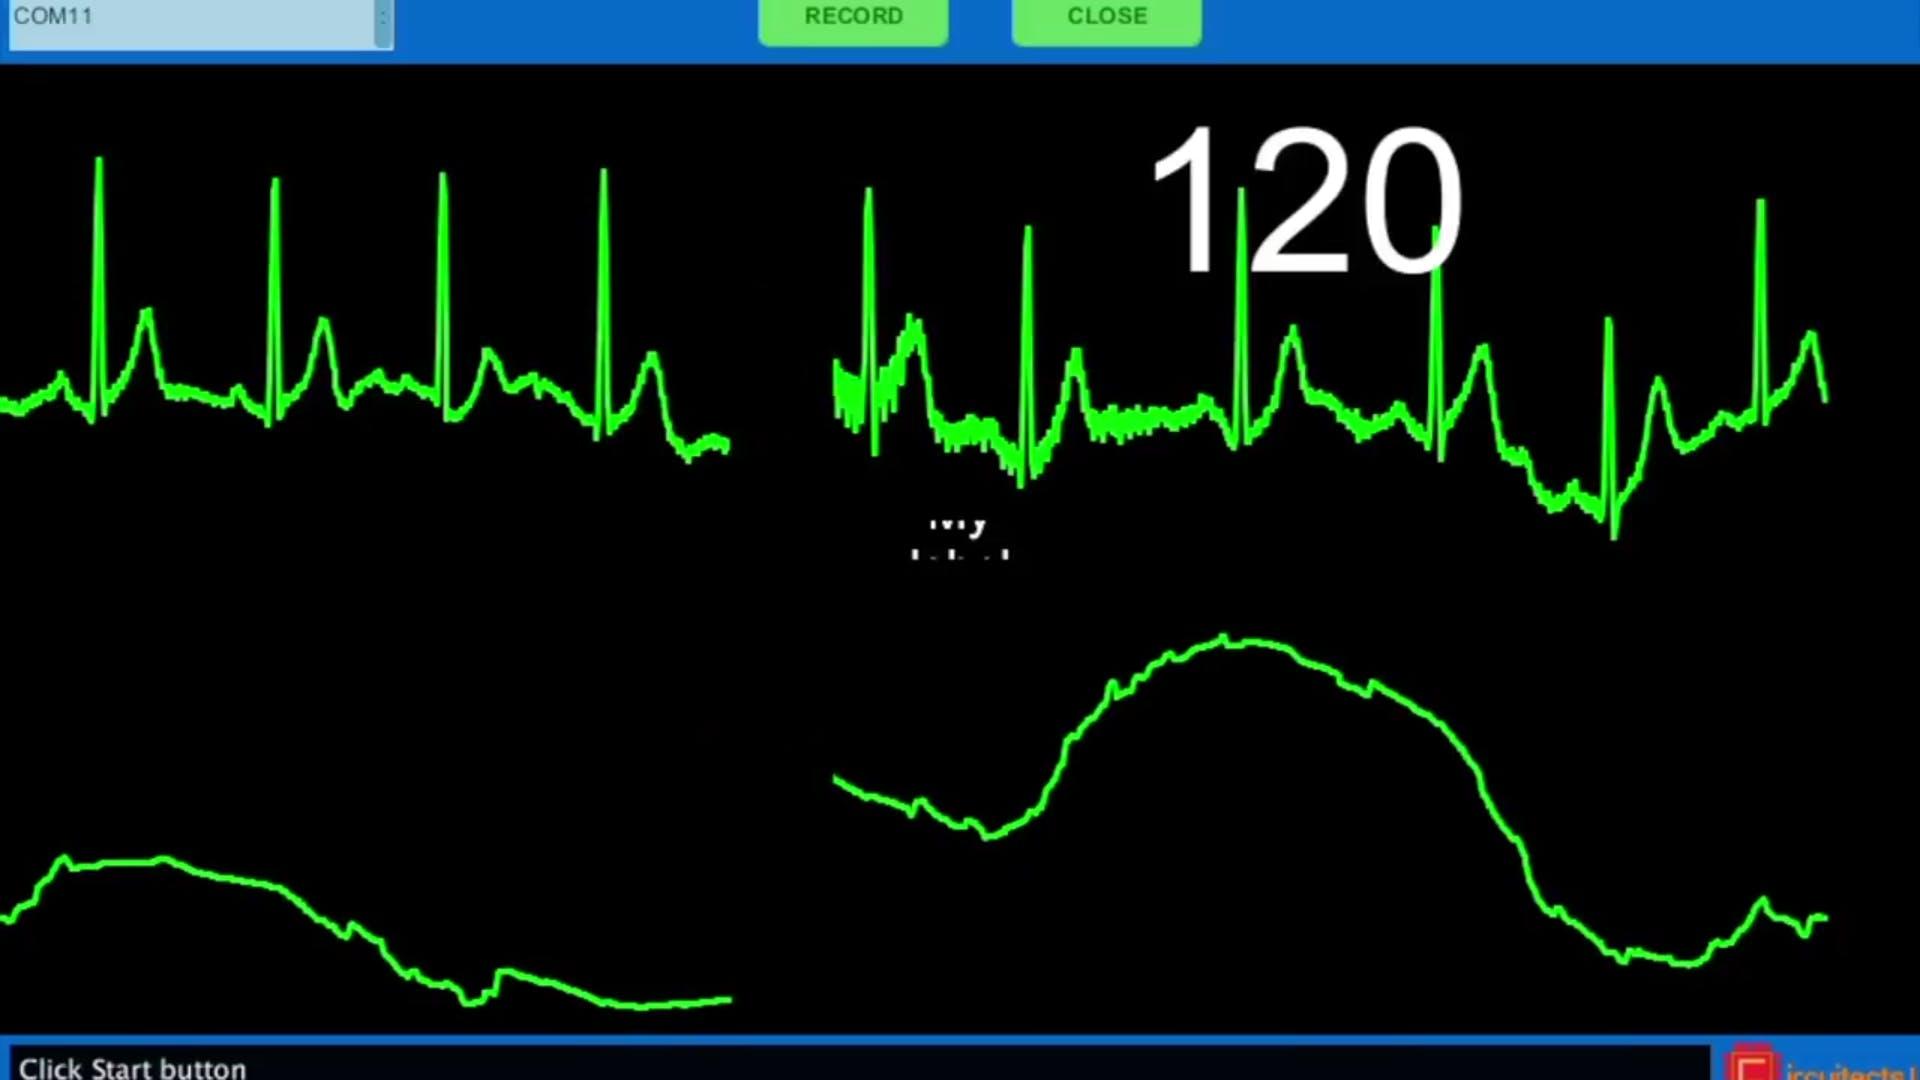 ECG data visualization